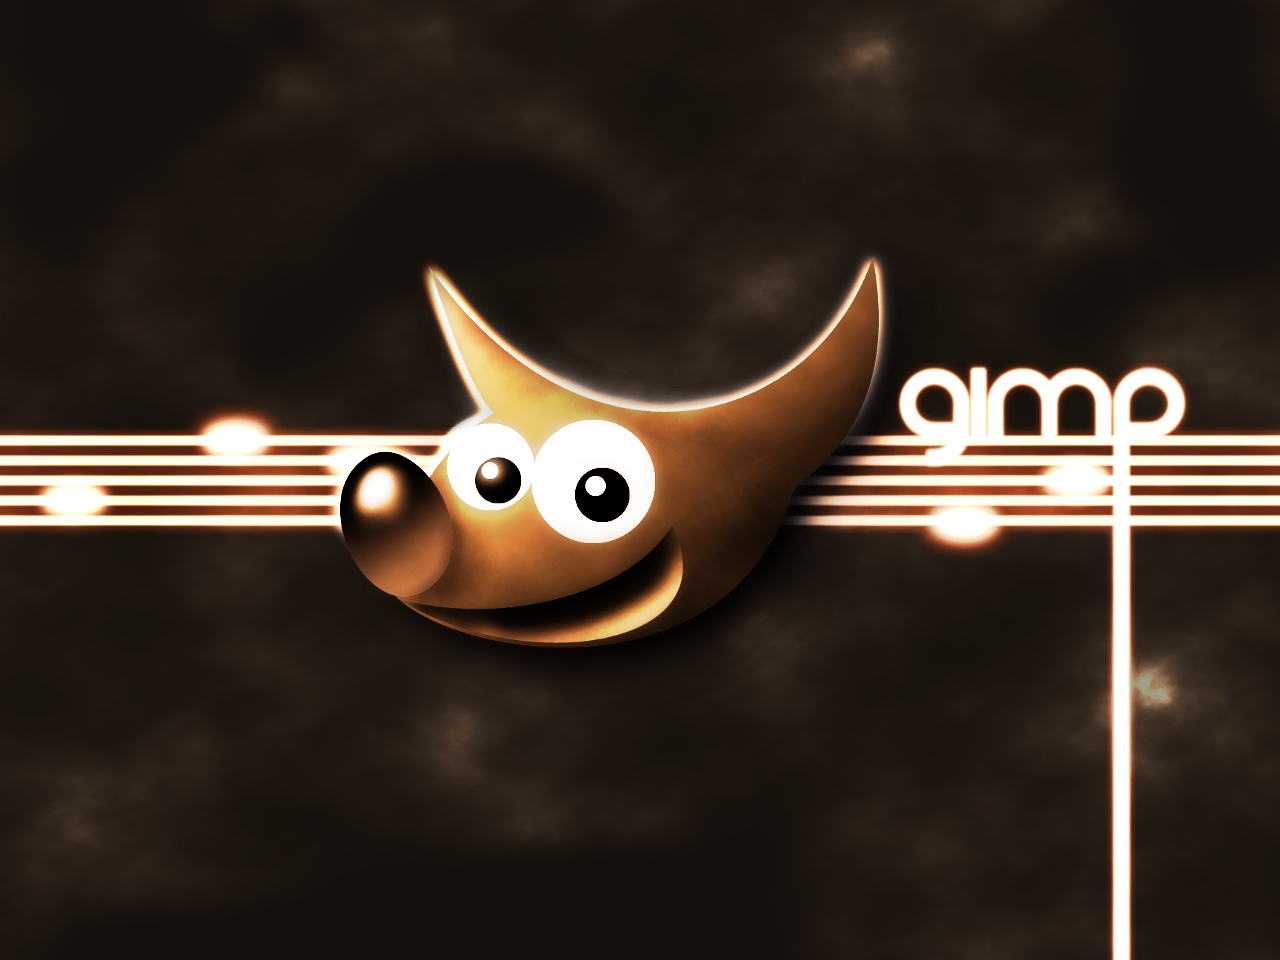 GIMP Wallpaper